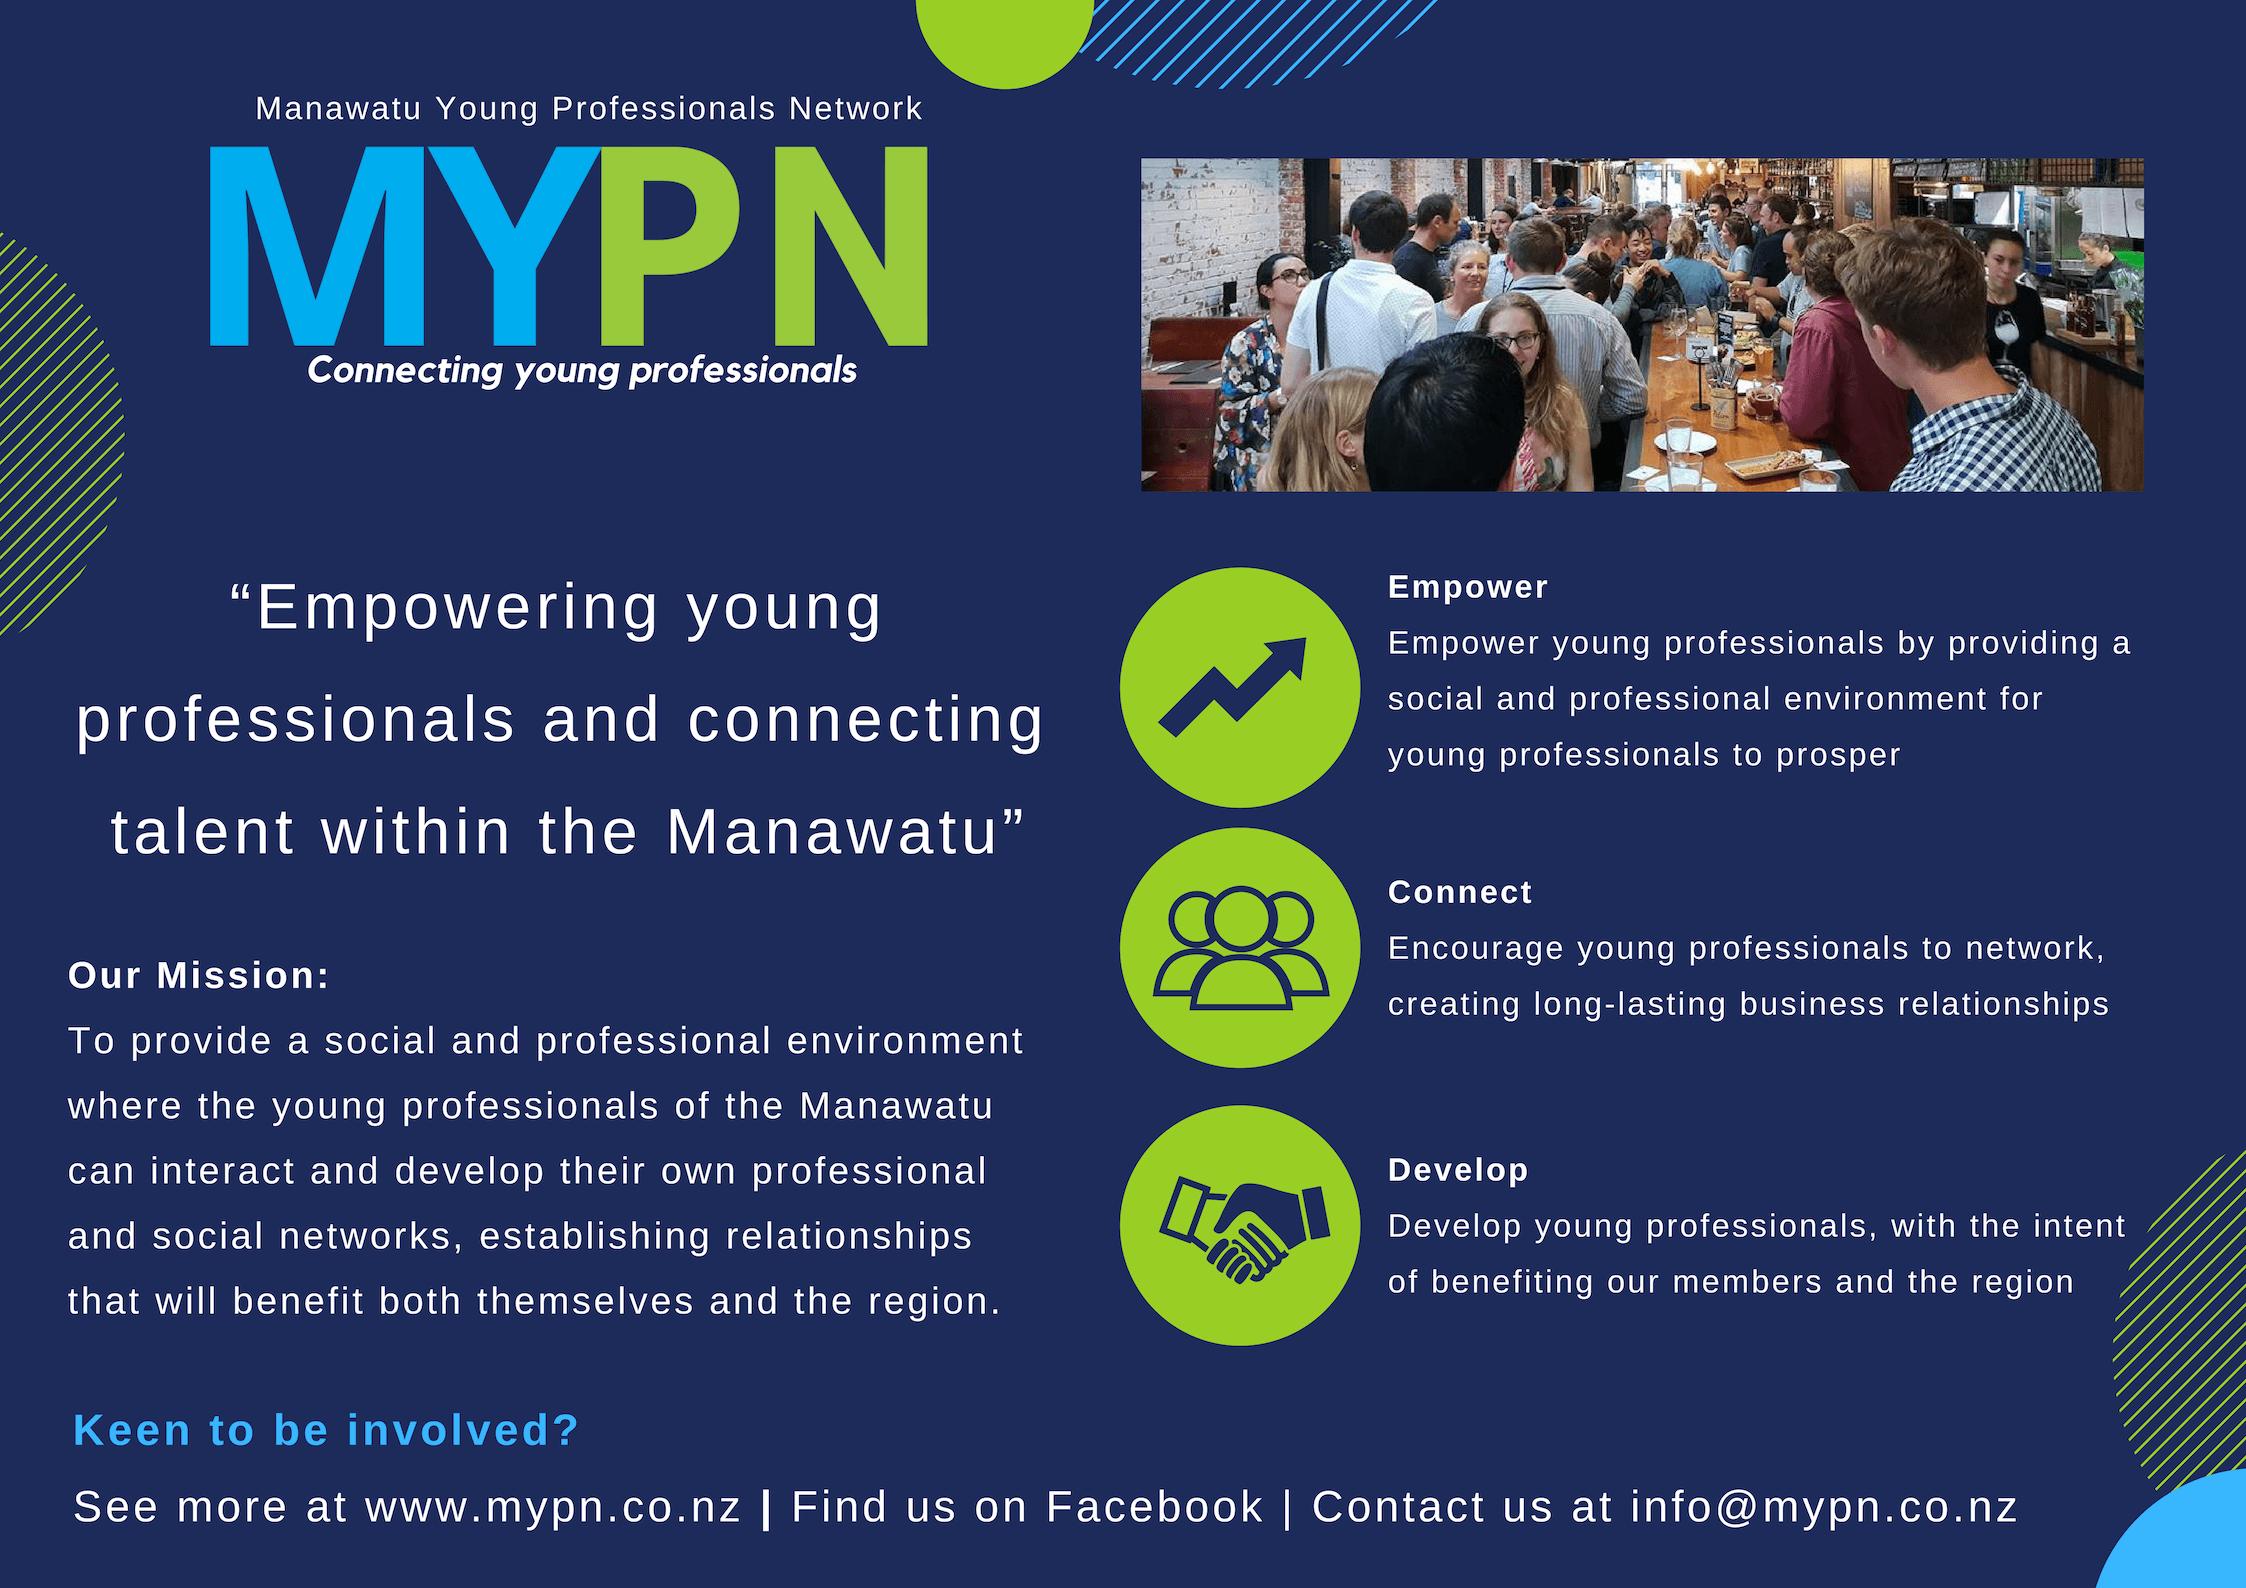 Manawatu Young Professionals Network (MYPN) - Jason Benbow